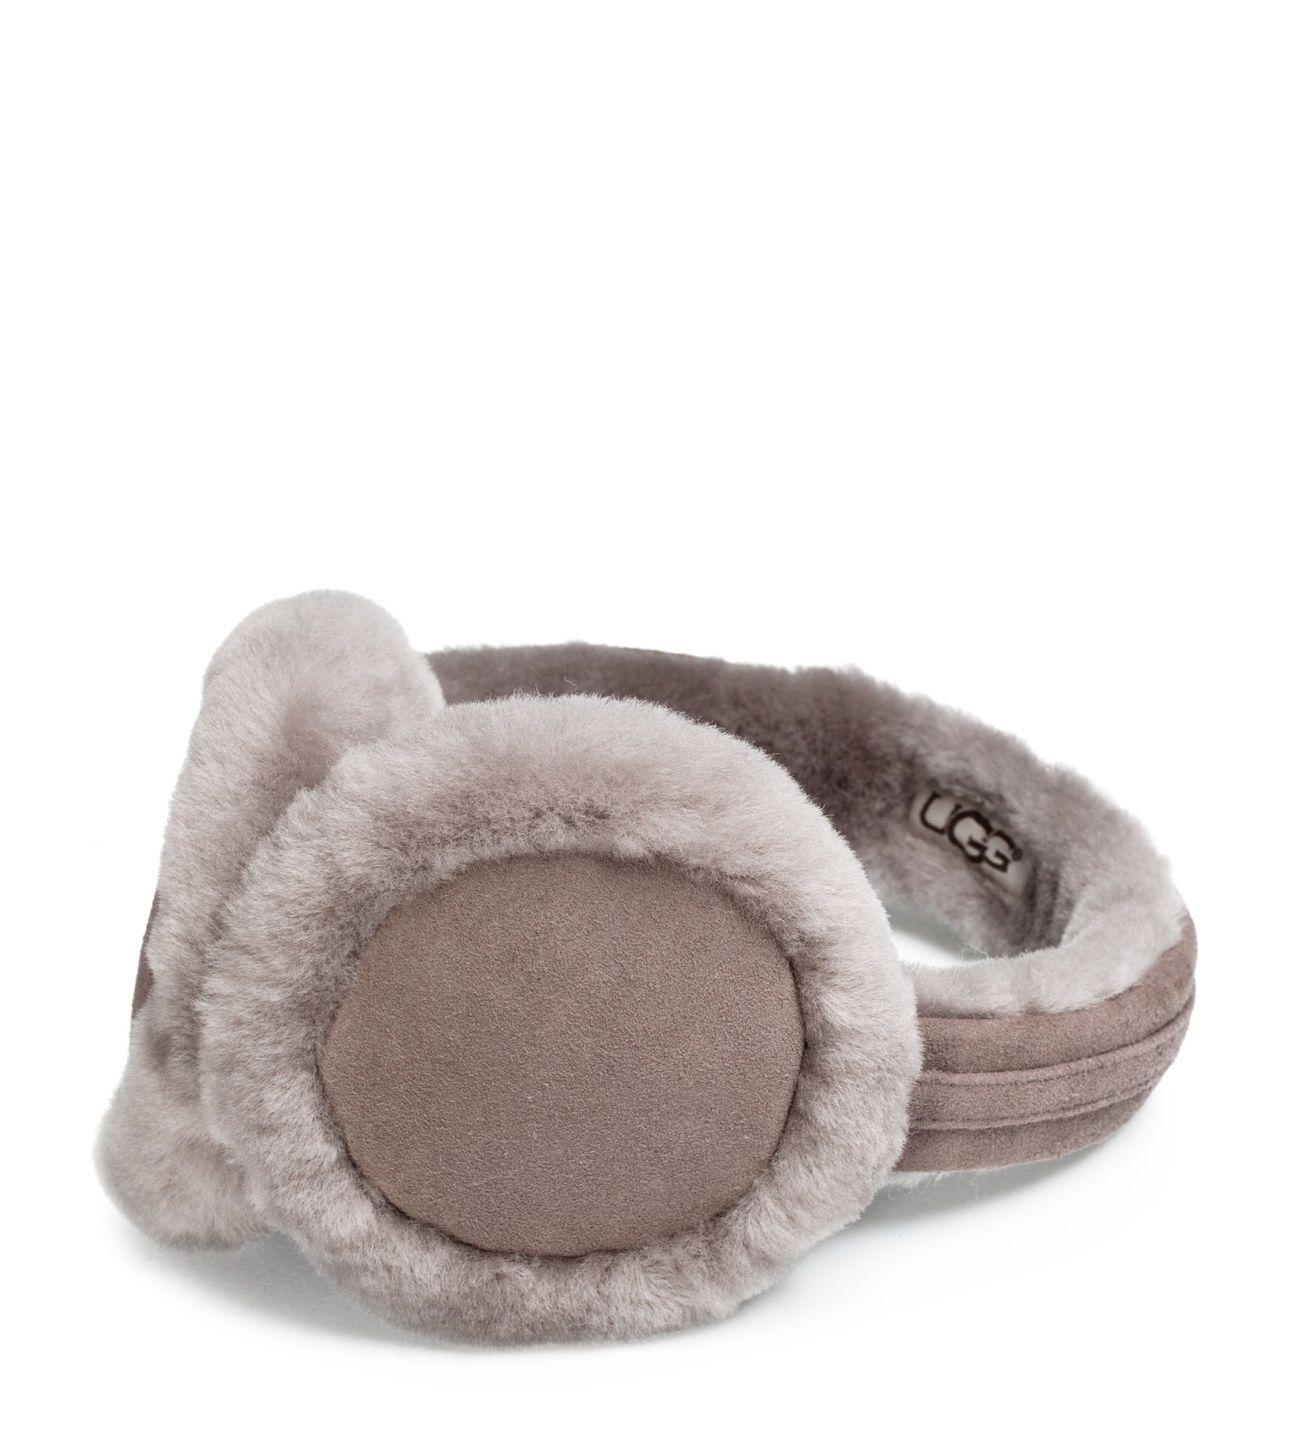 e3ab692497b UGG® Carry Forward Classic Sheepskin Earmuff Earmuffs for Women ...